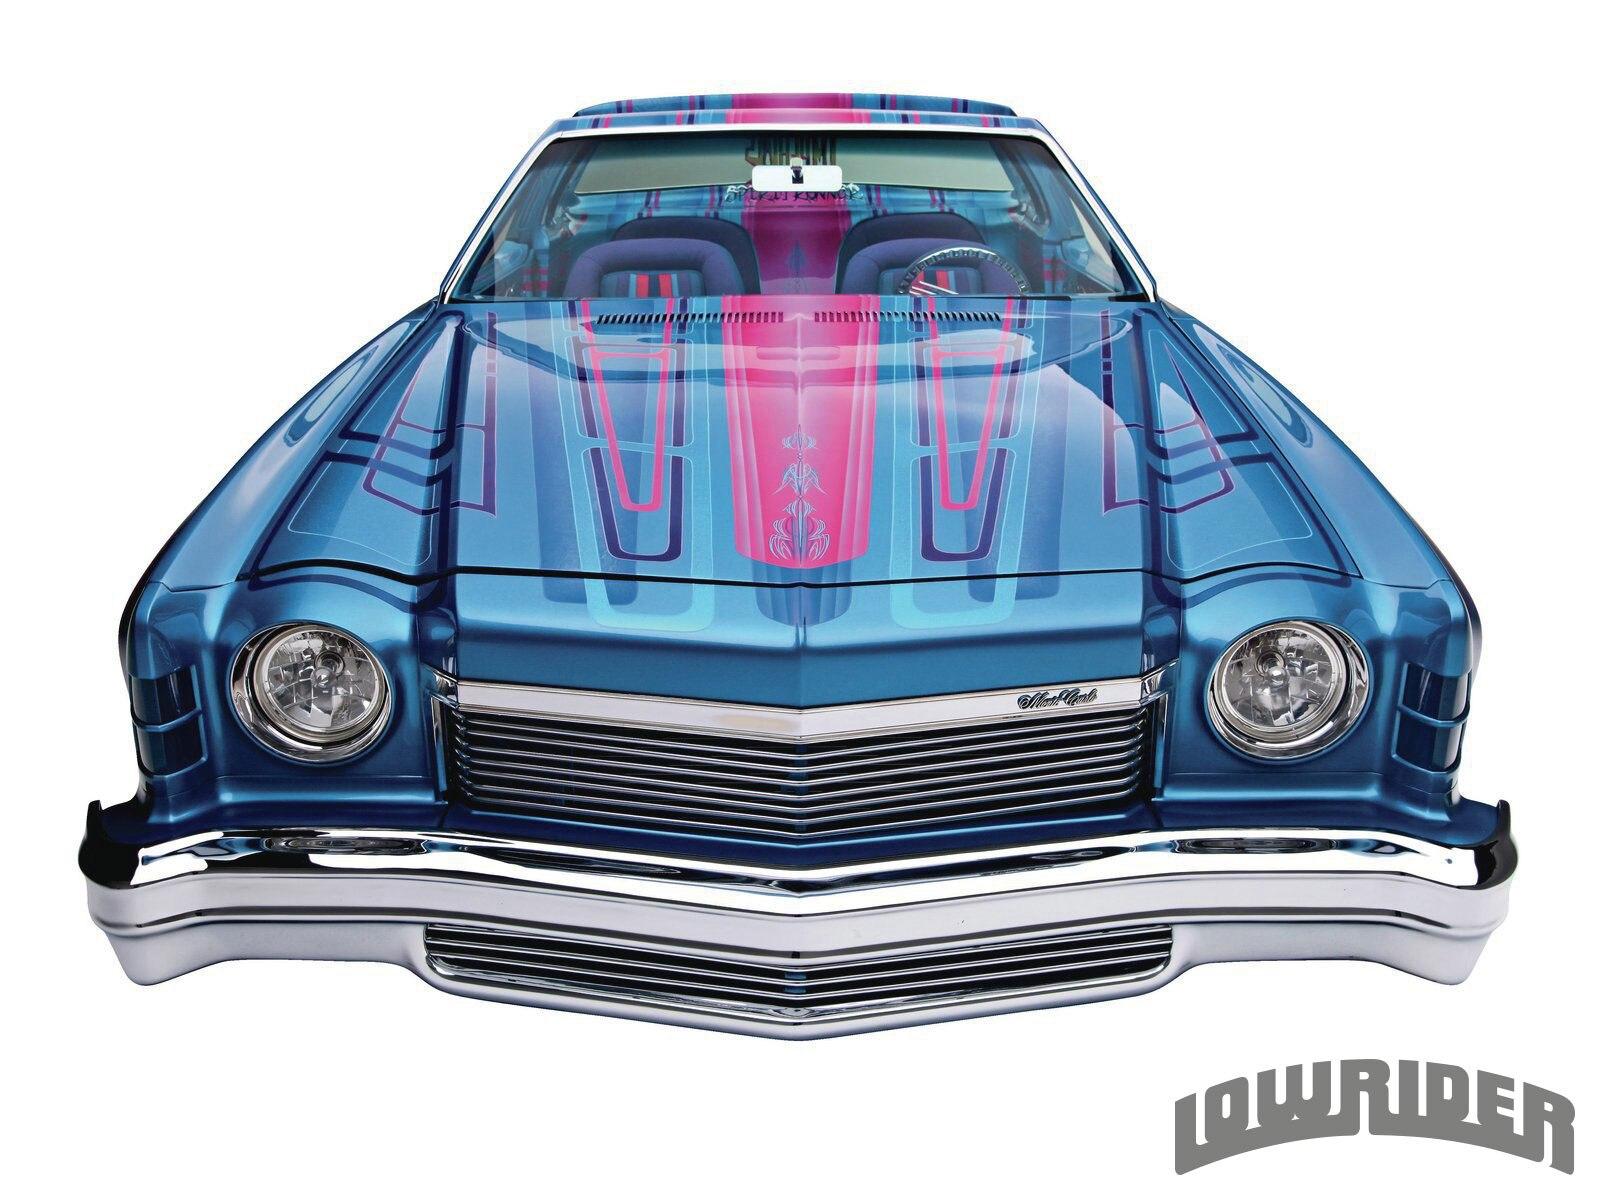 1303-lrmp-01-o-lowrider-custom-paint-jobs-1974-monte-carlo1